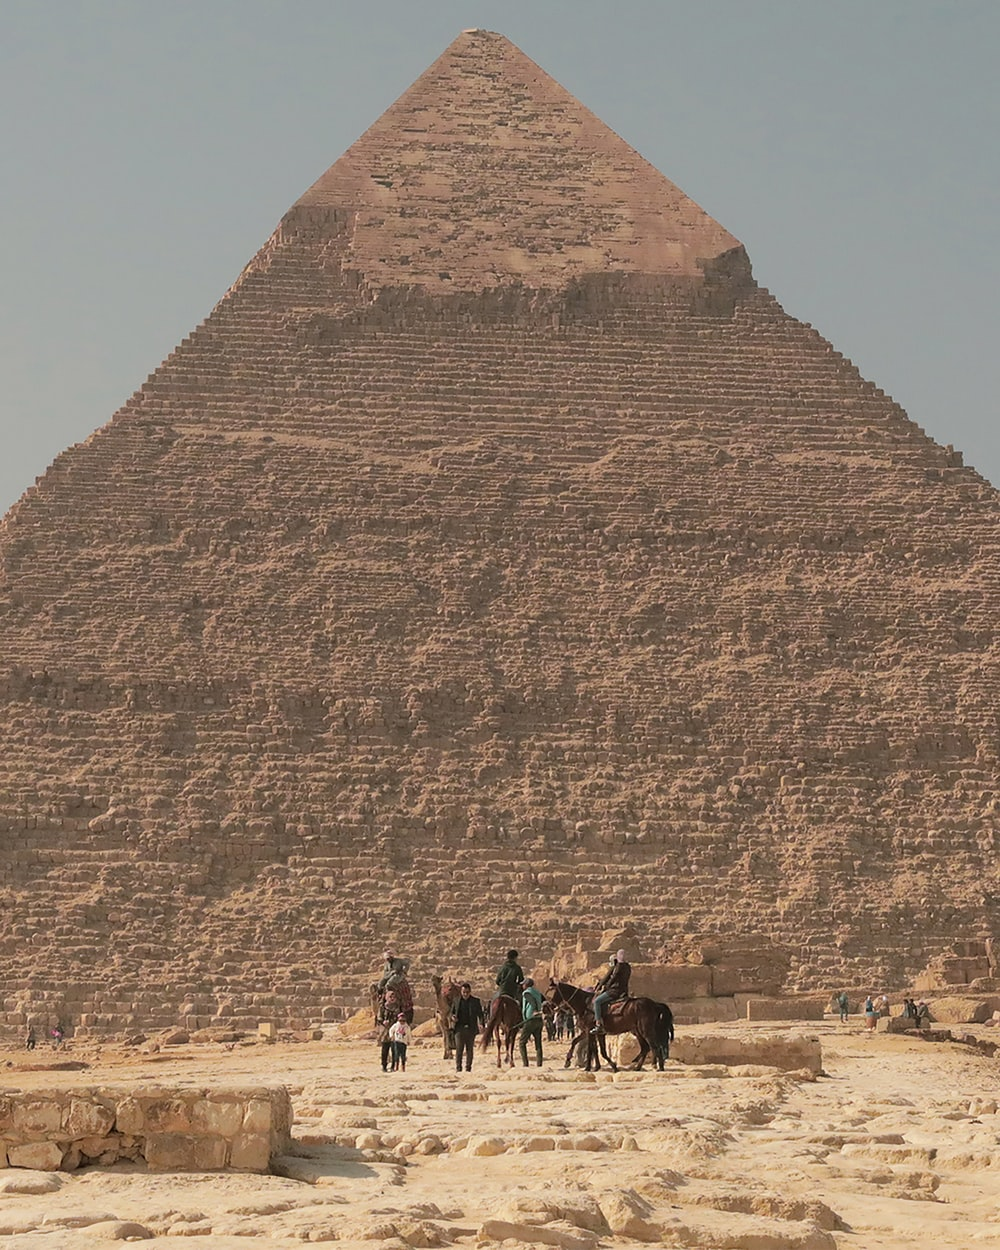 people walking on brown sand near pyramid during daytime